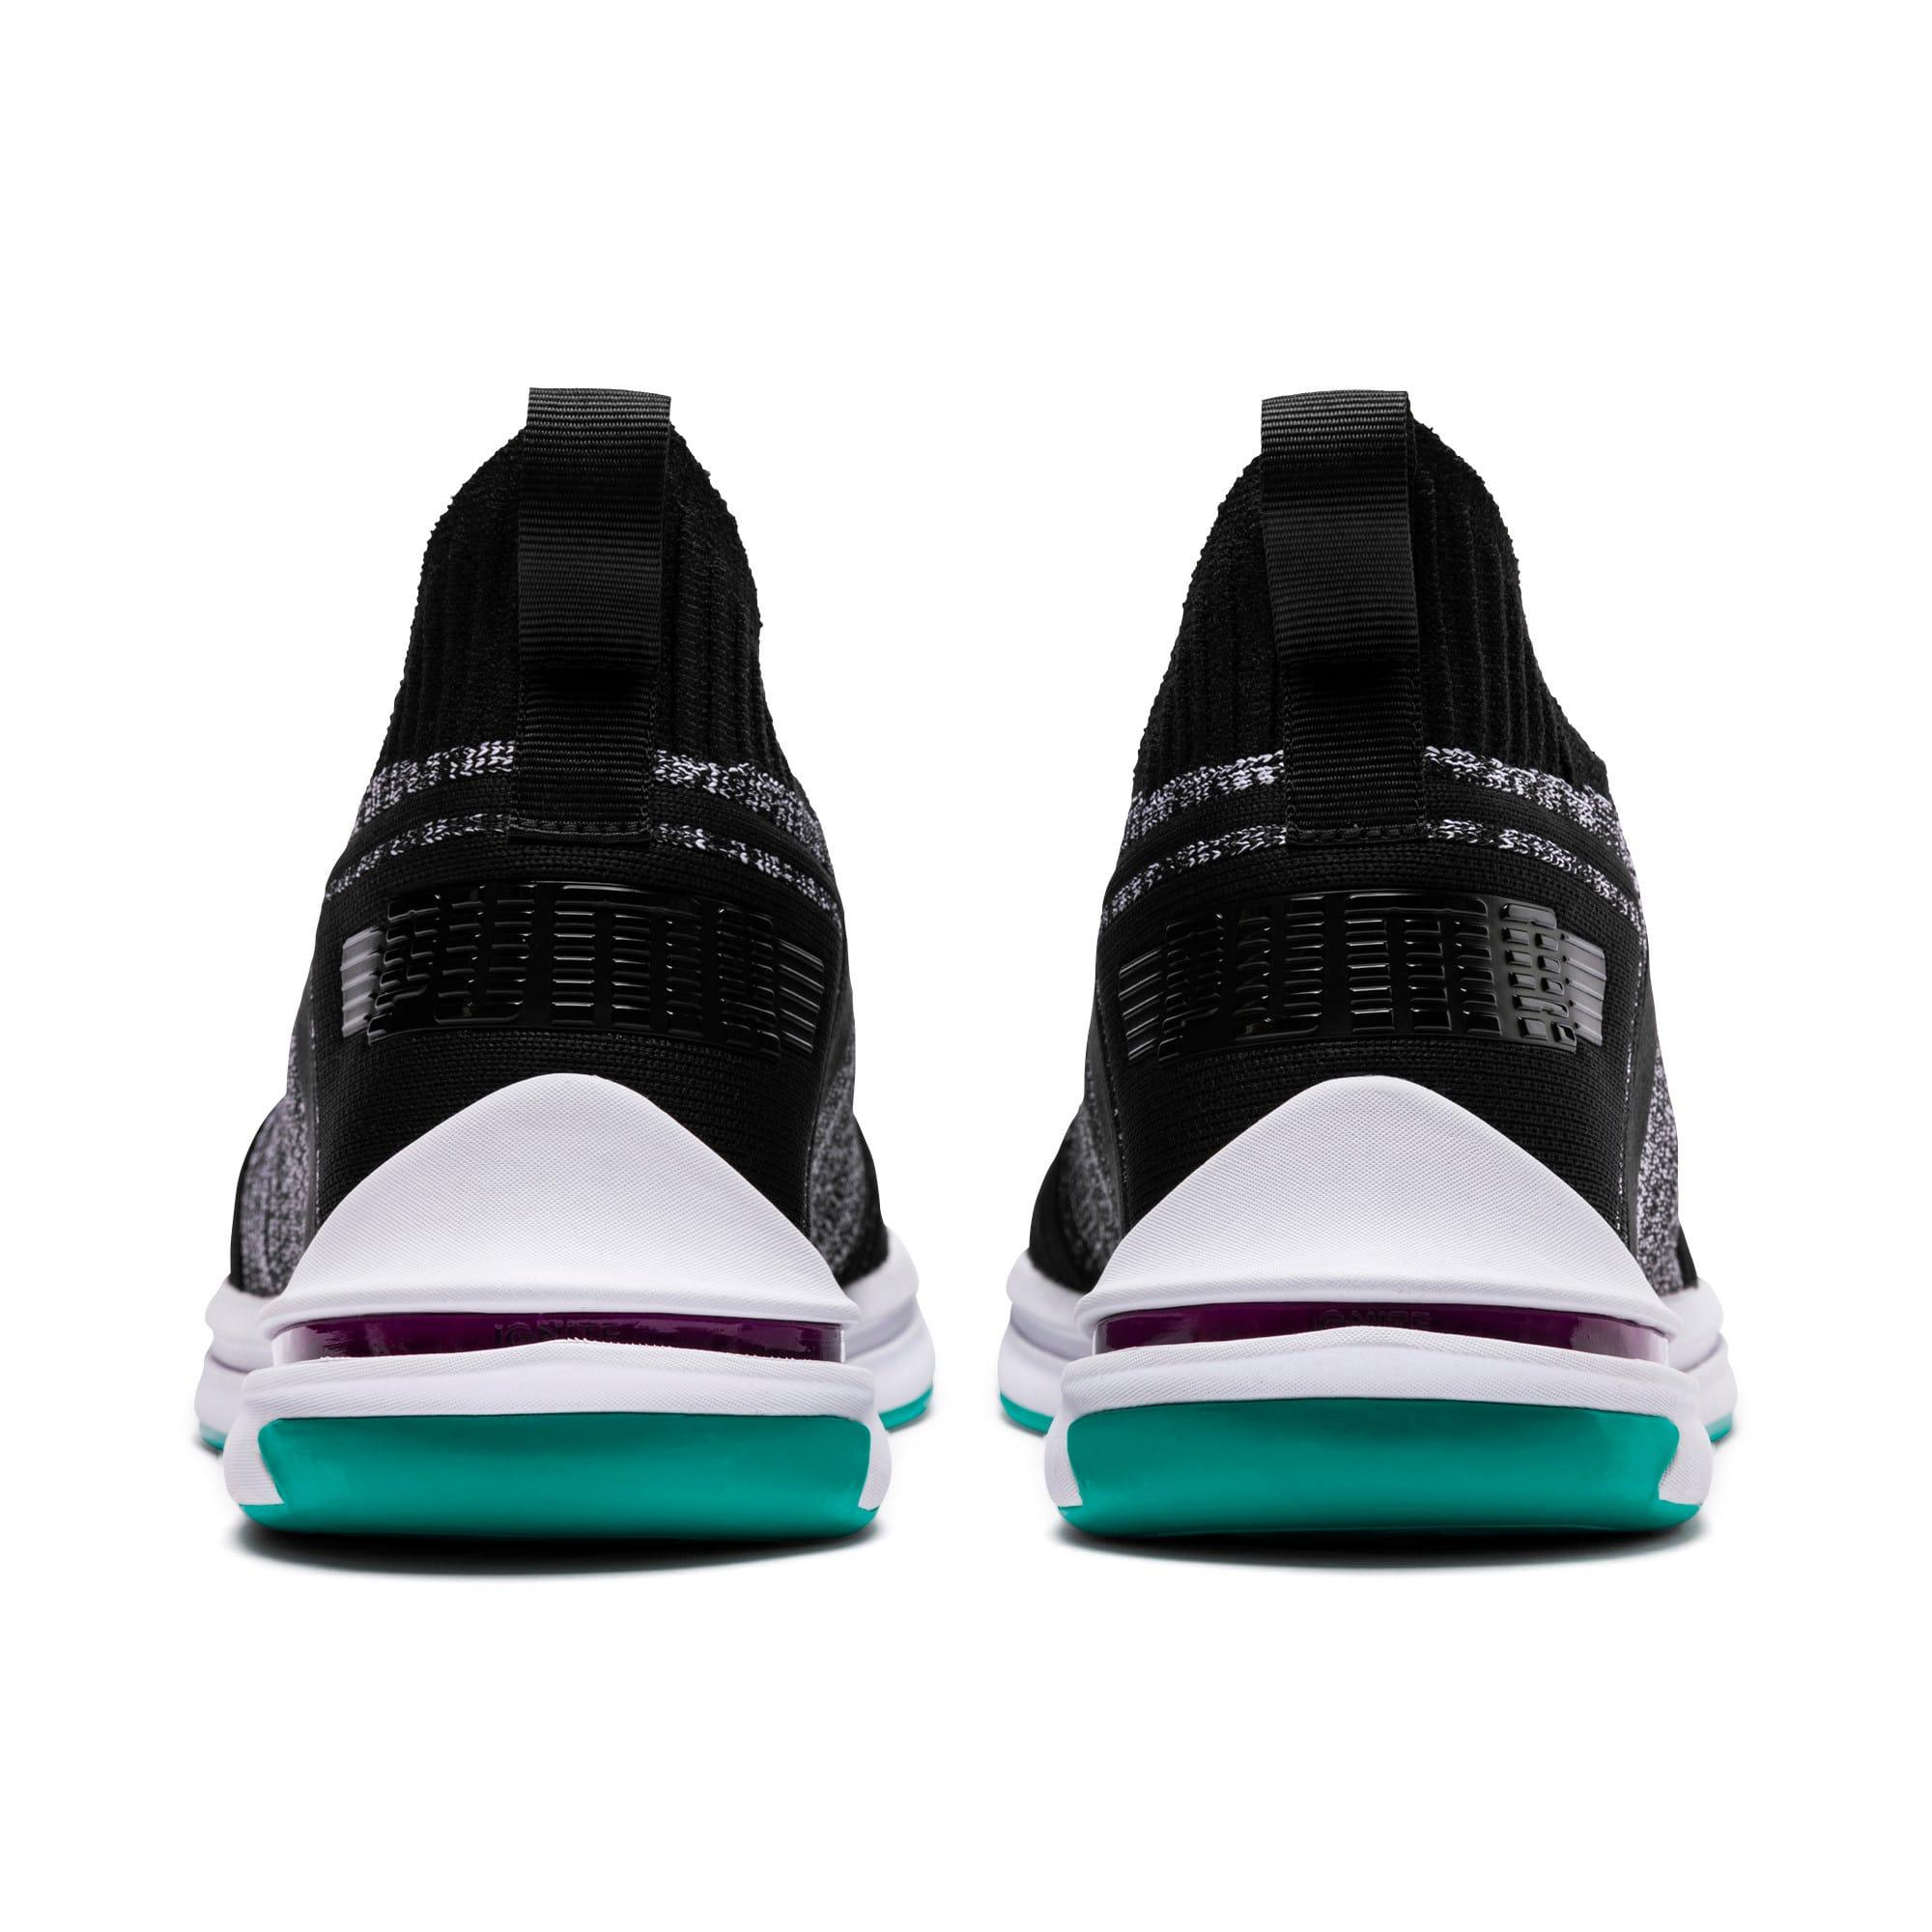 Thumbnail 4 of IGNITE Limitless SR evoKNIT Men's Sneakers, Puma Black-Spectra Green, medium